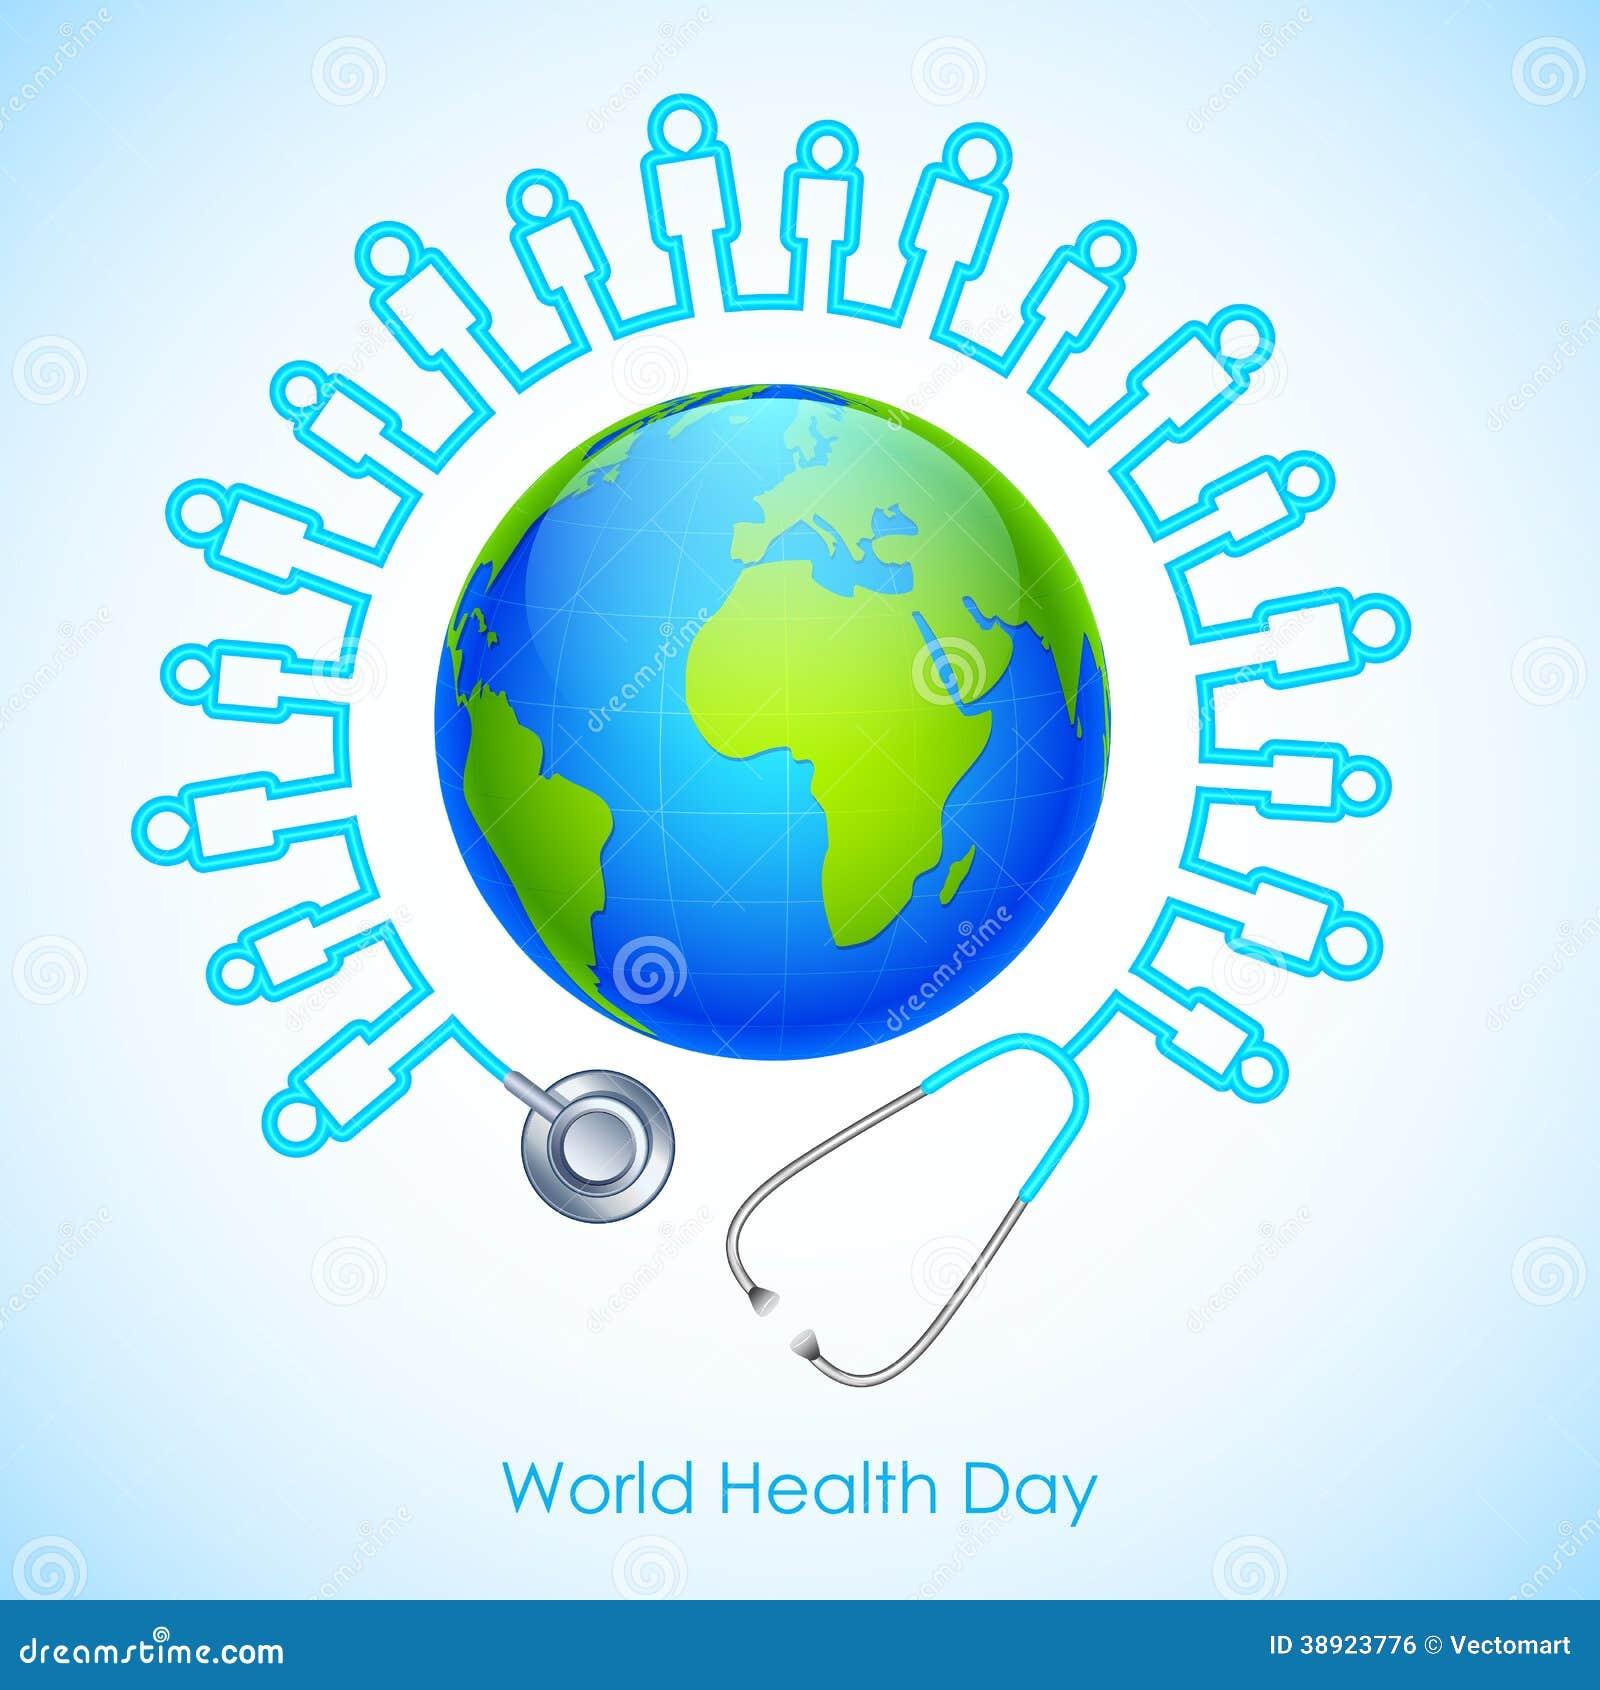 world health day stock vector   image 38923776